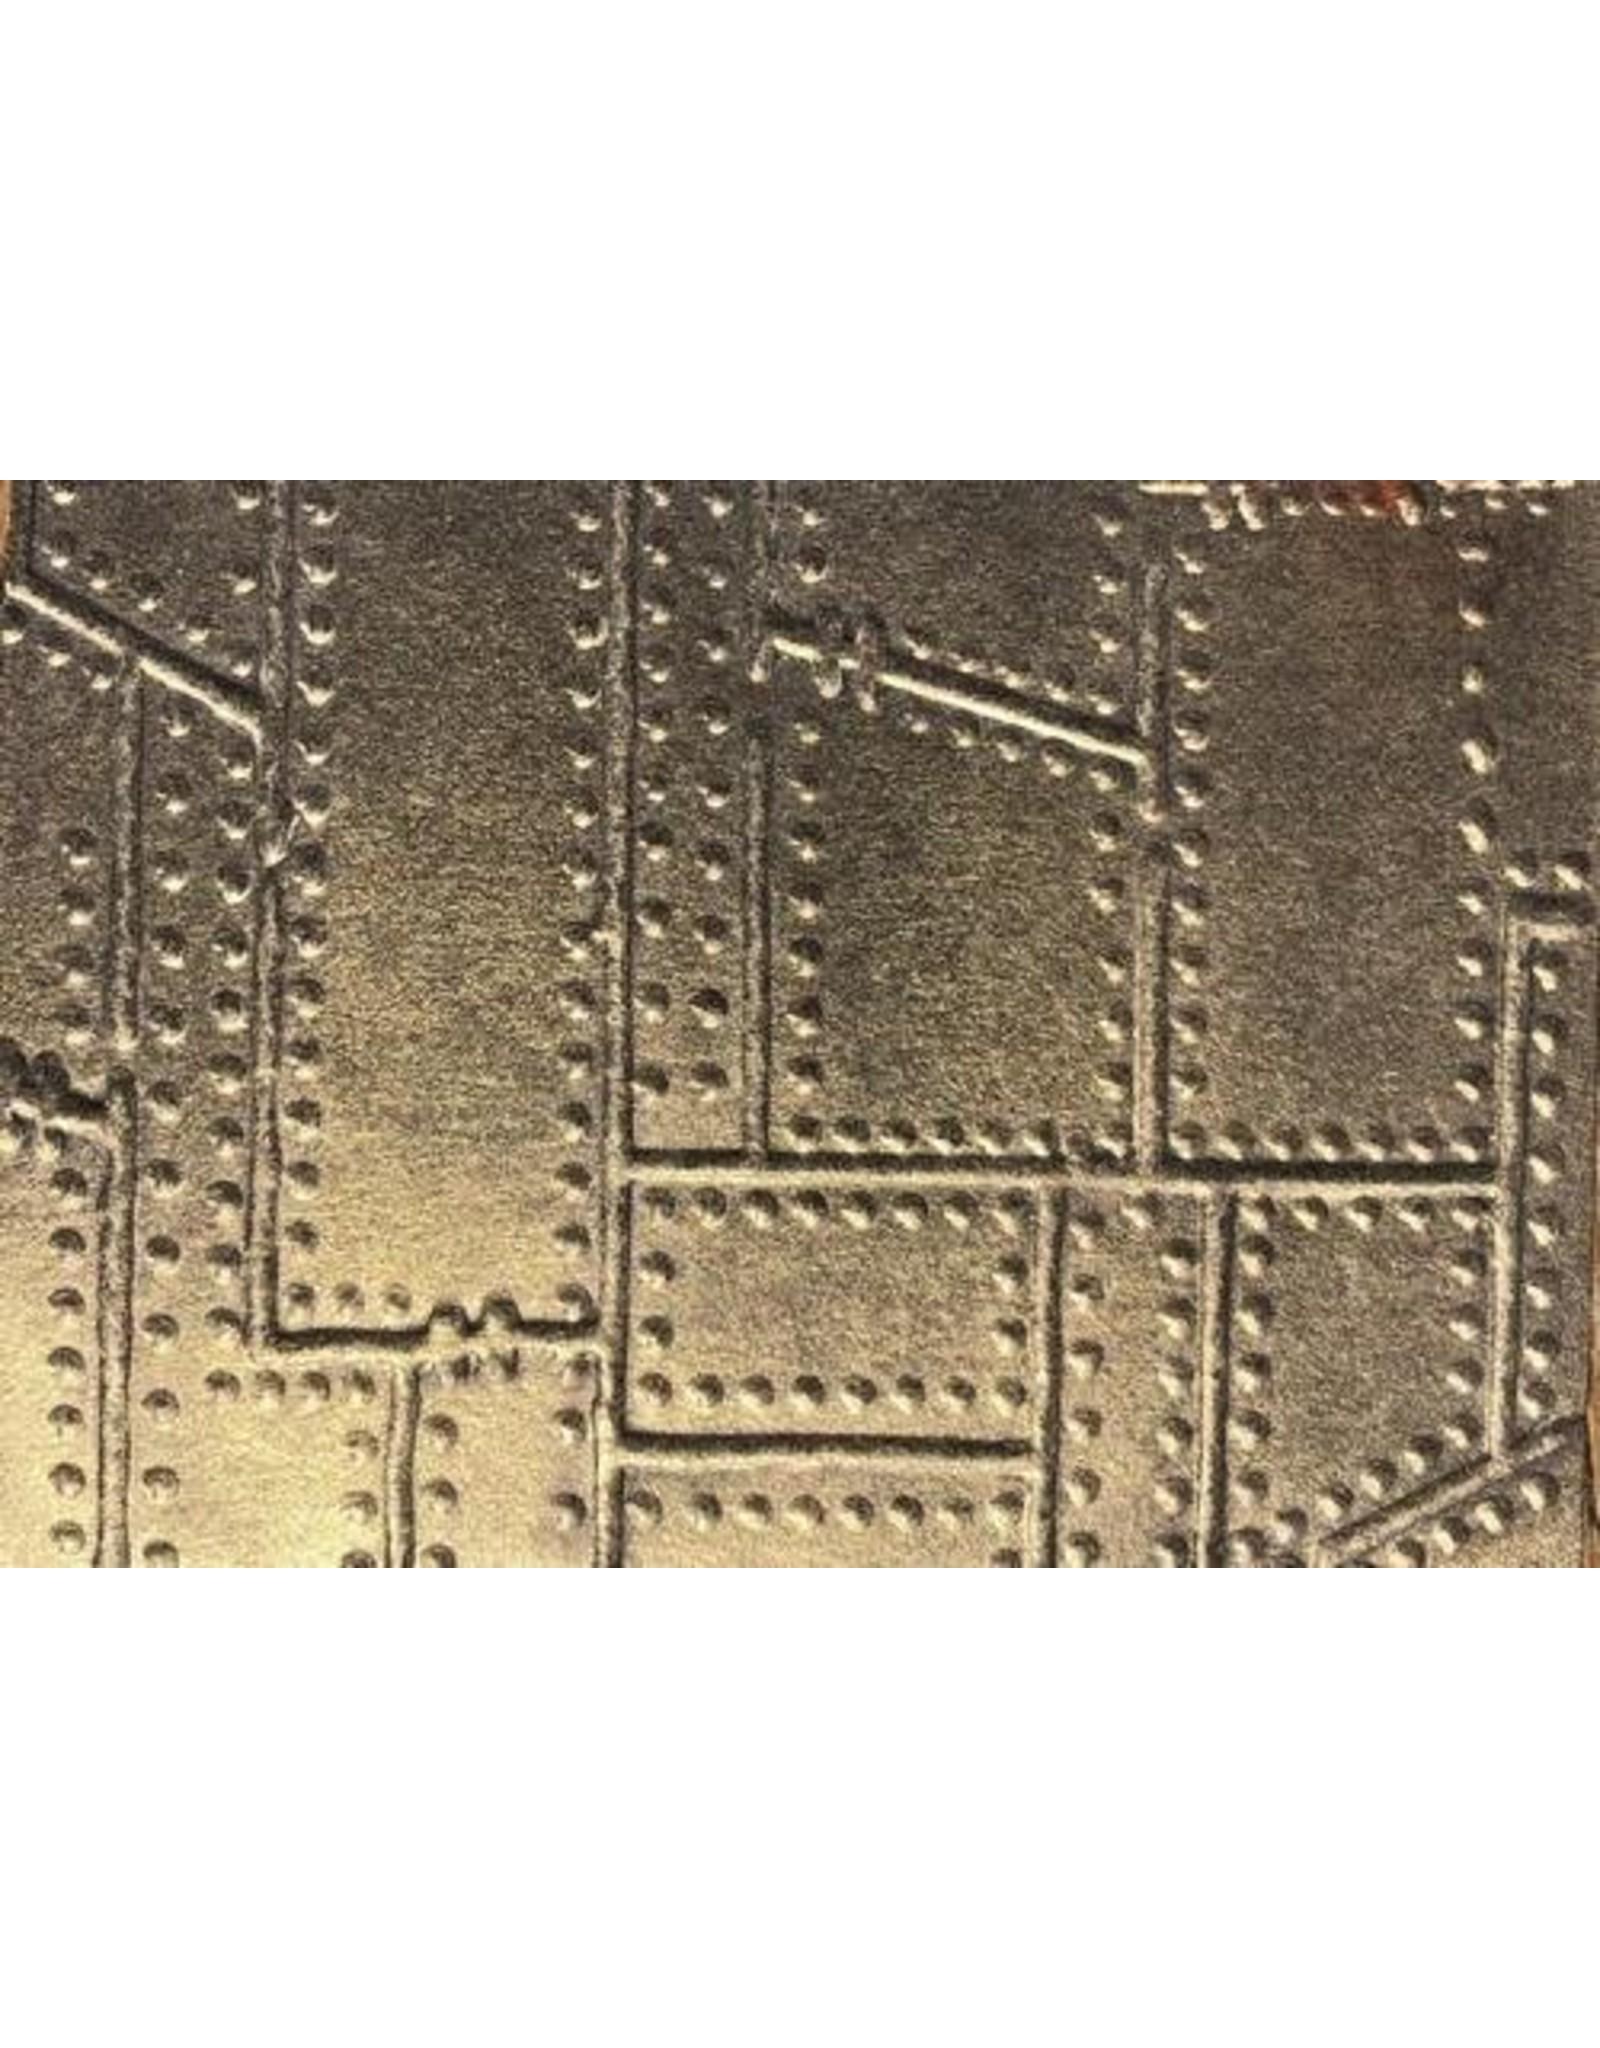 COOSA Crafts Wax COOSA Crafts Gilding Wax - Vintage Gold